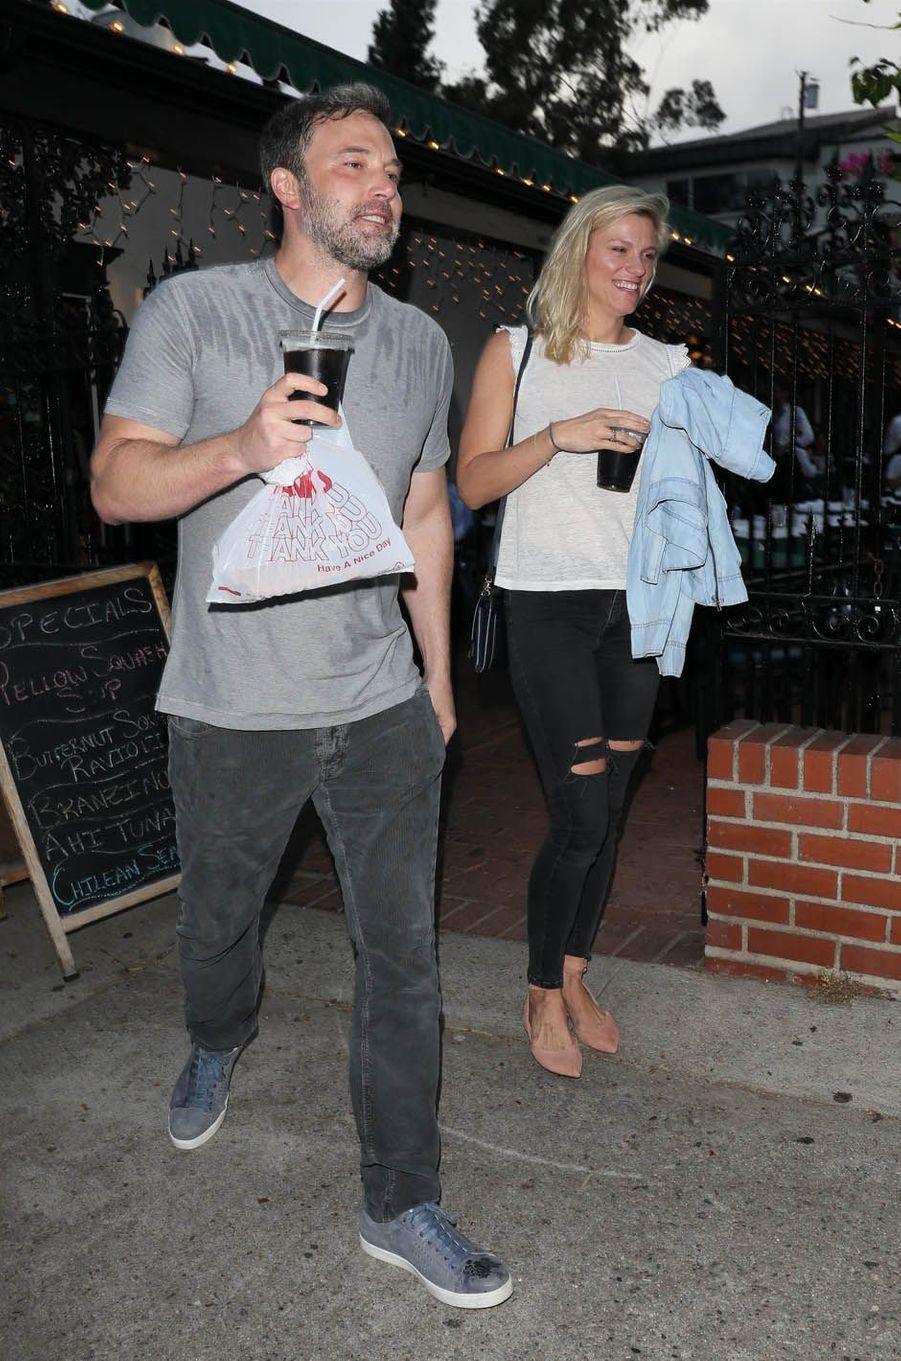 Ben Affleck et sa compagne Lindsay Shookus à Pacific Palissades, le 10 juillet 2017.